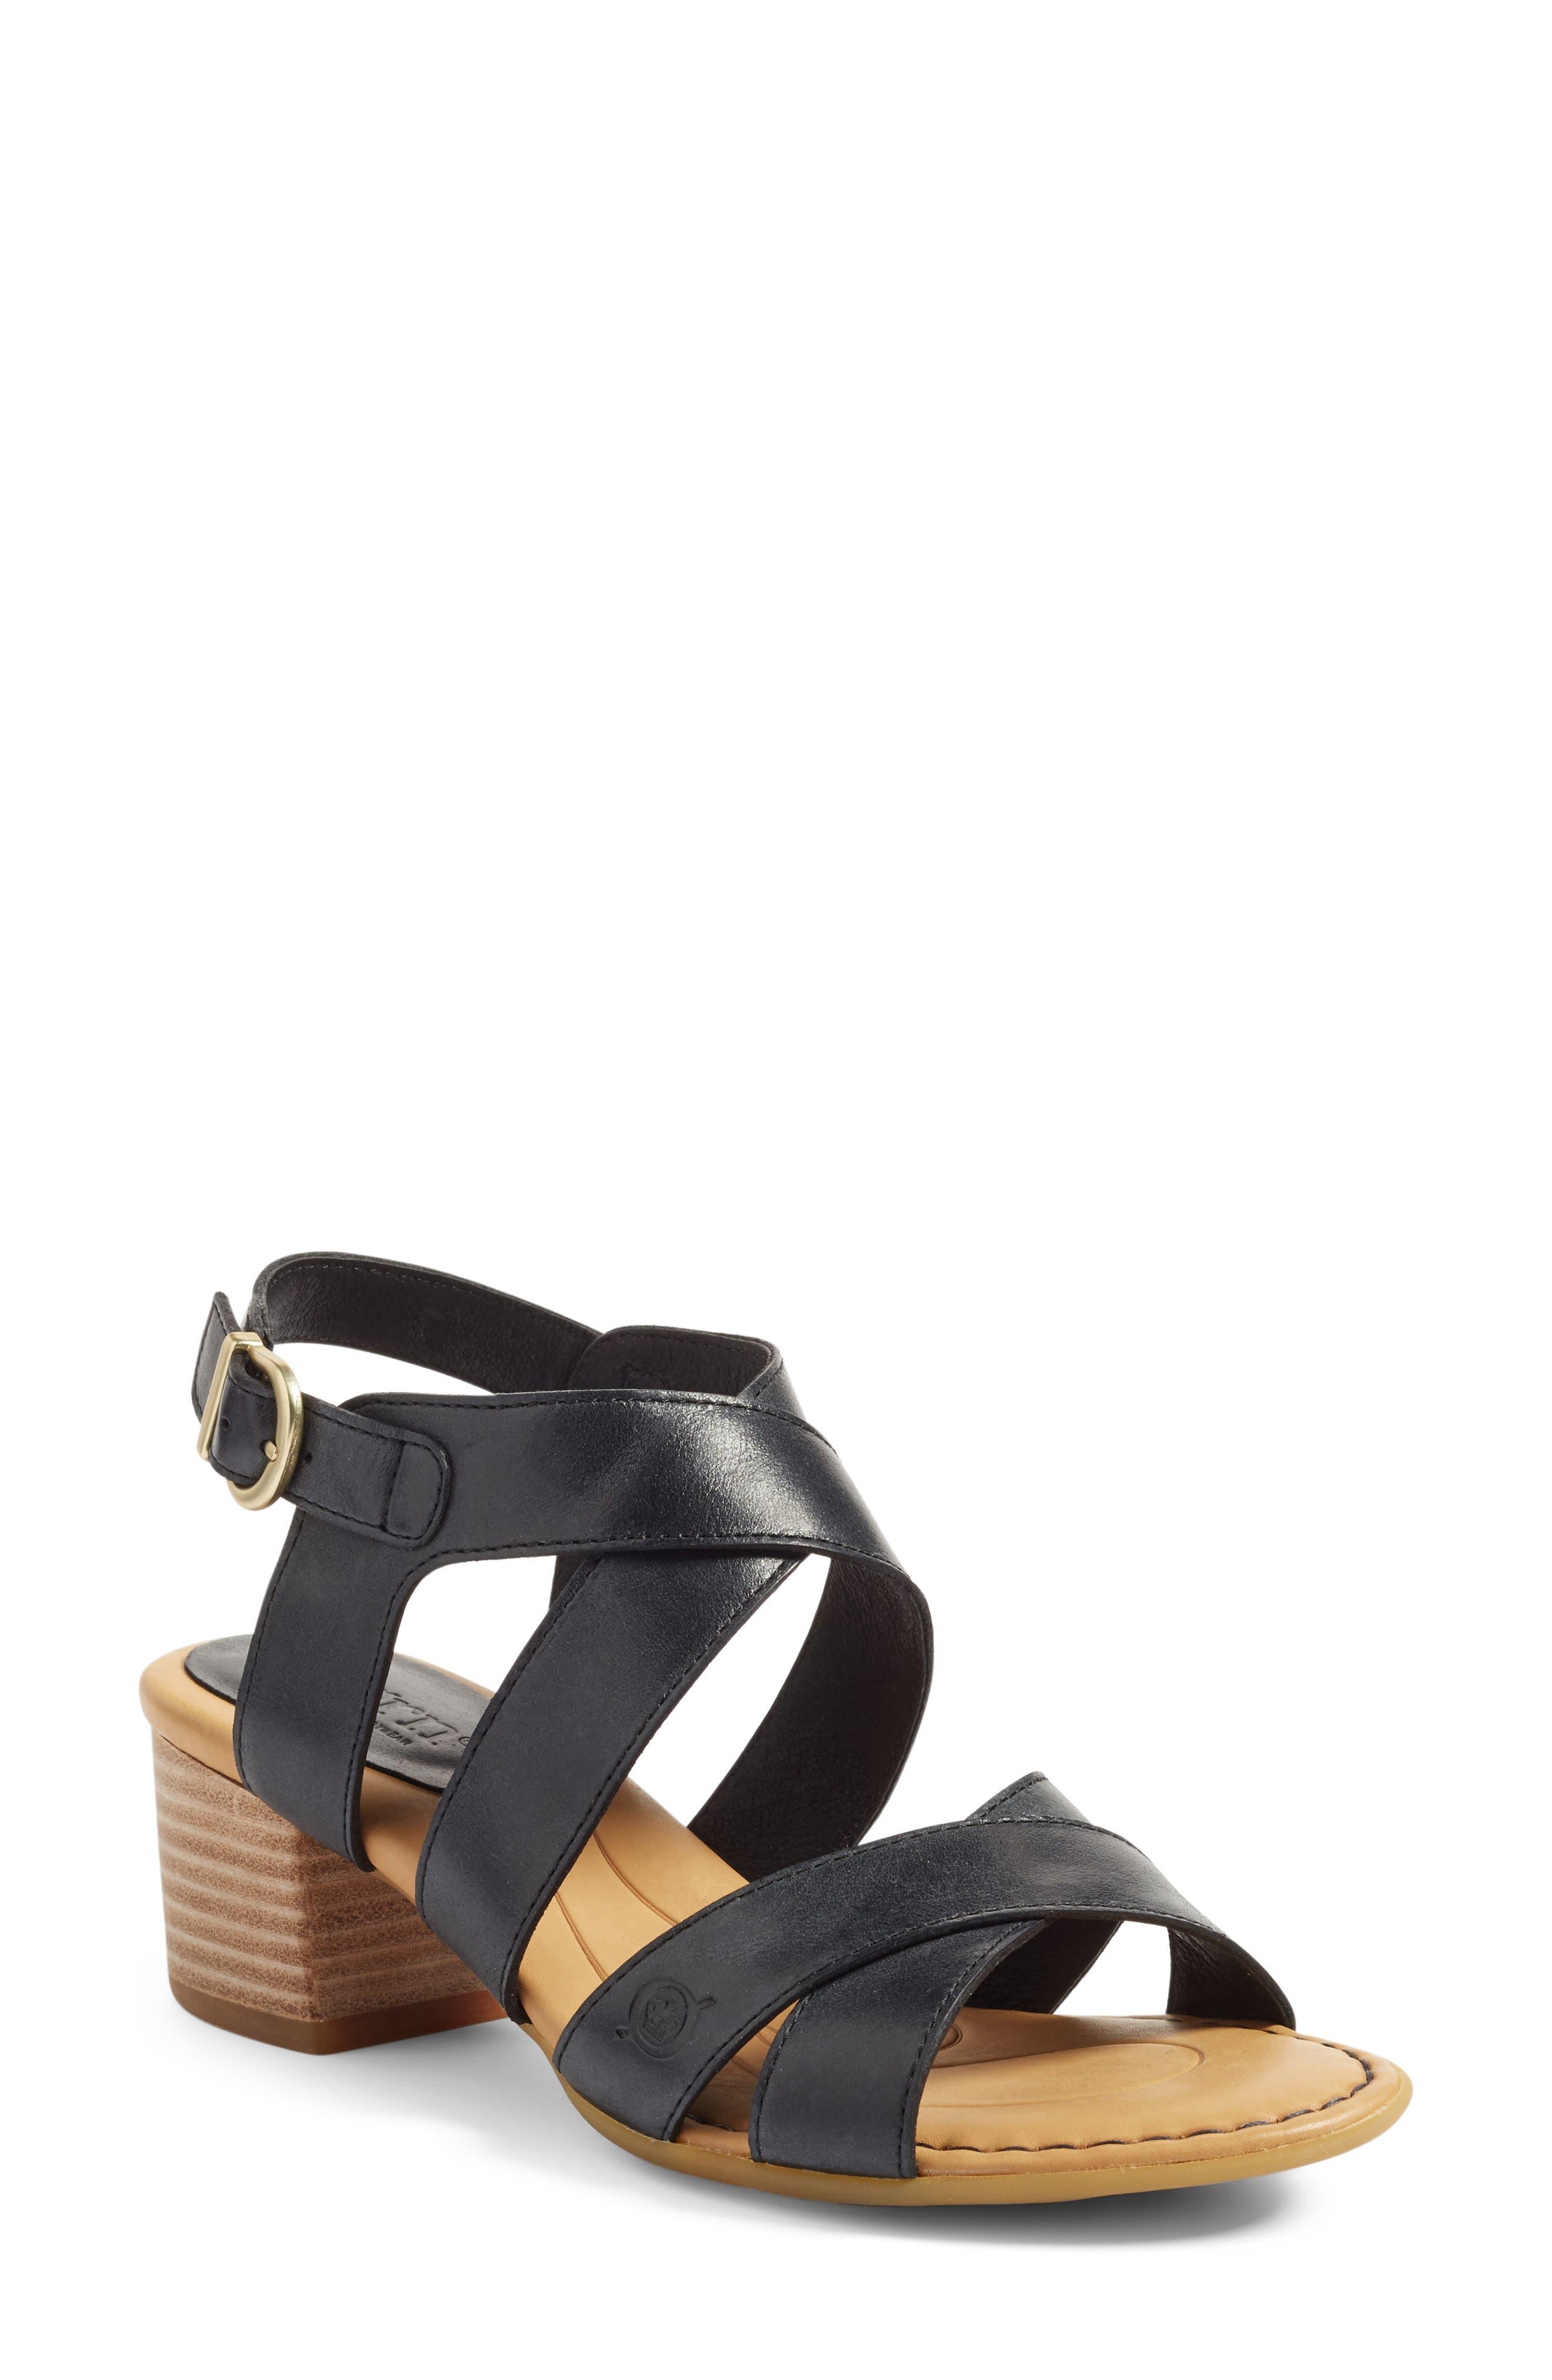 Alternate Image 1 Selected - Børn Alisha Block Heel Sandal (Women)